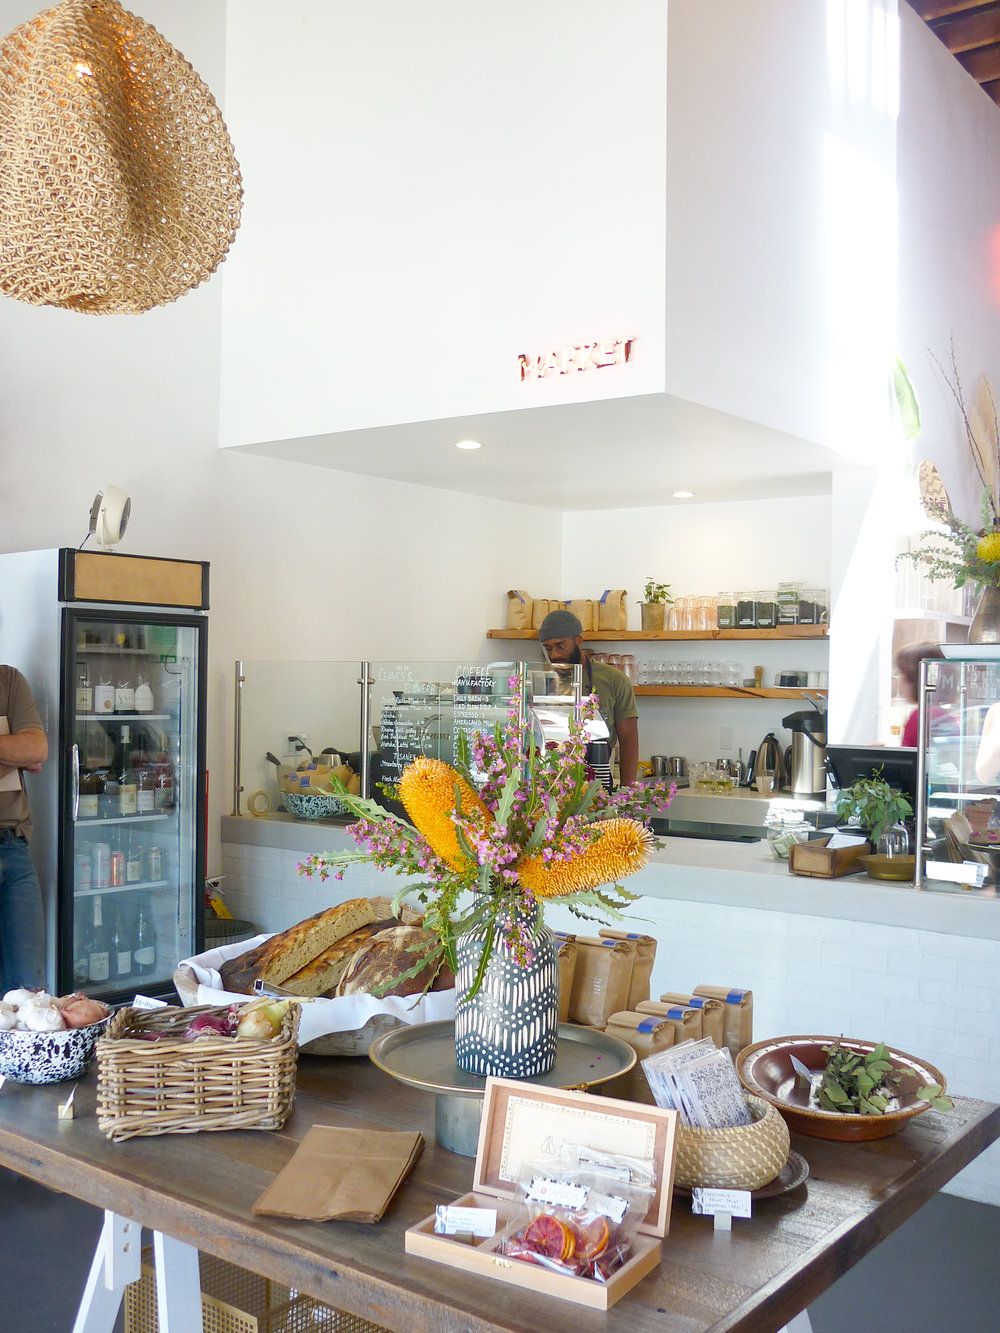 Botanica - Silver Lake City Guide - Los Angeles - The LA Bliss